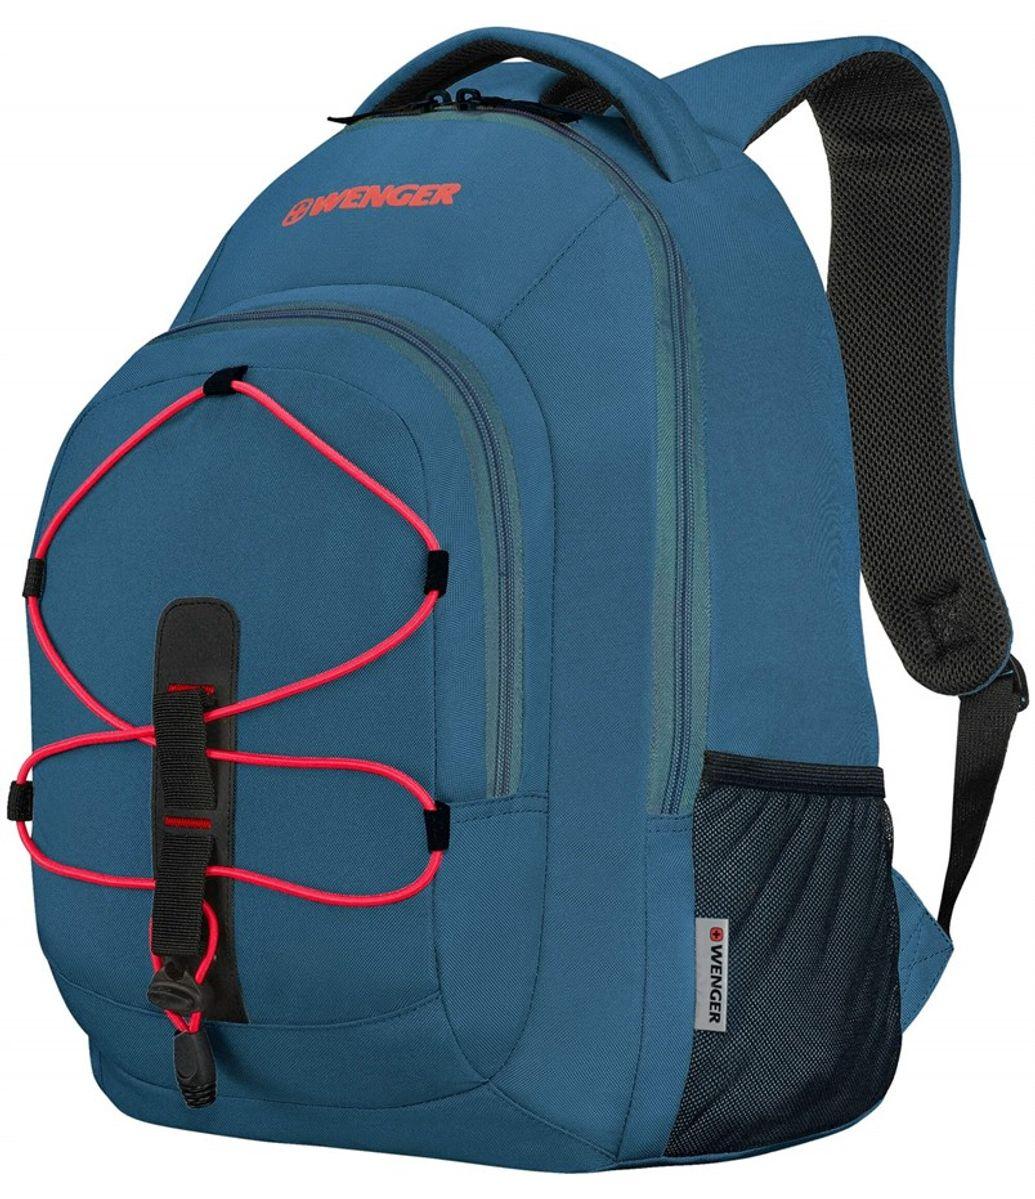 Mochila Wenger Mars Azul / Vermelha